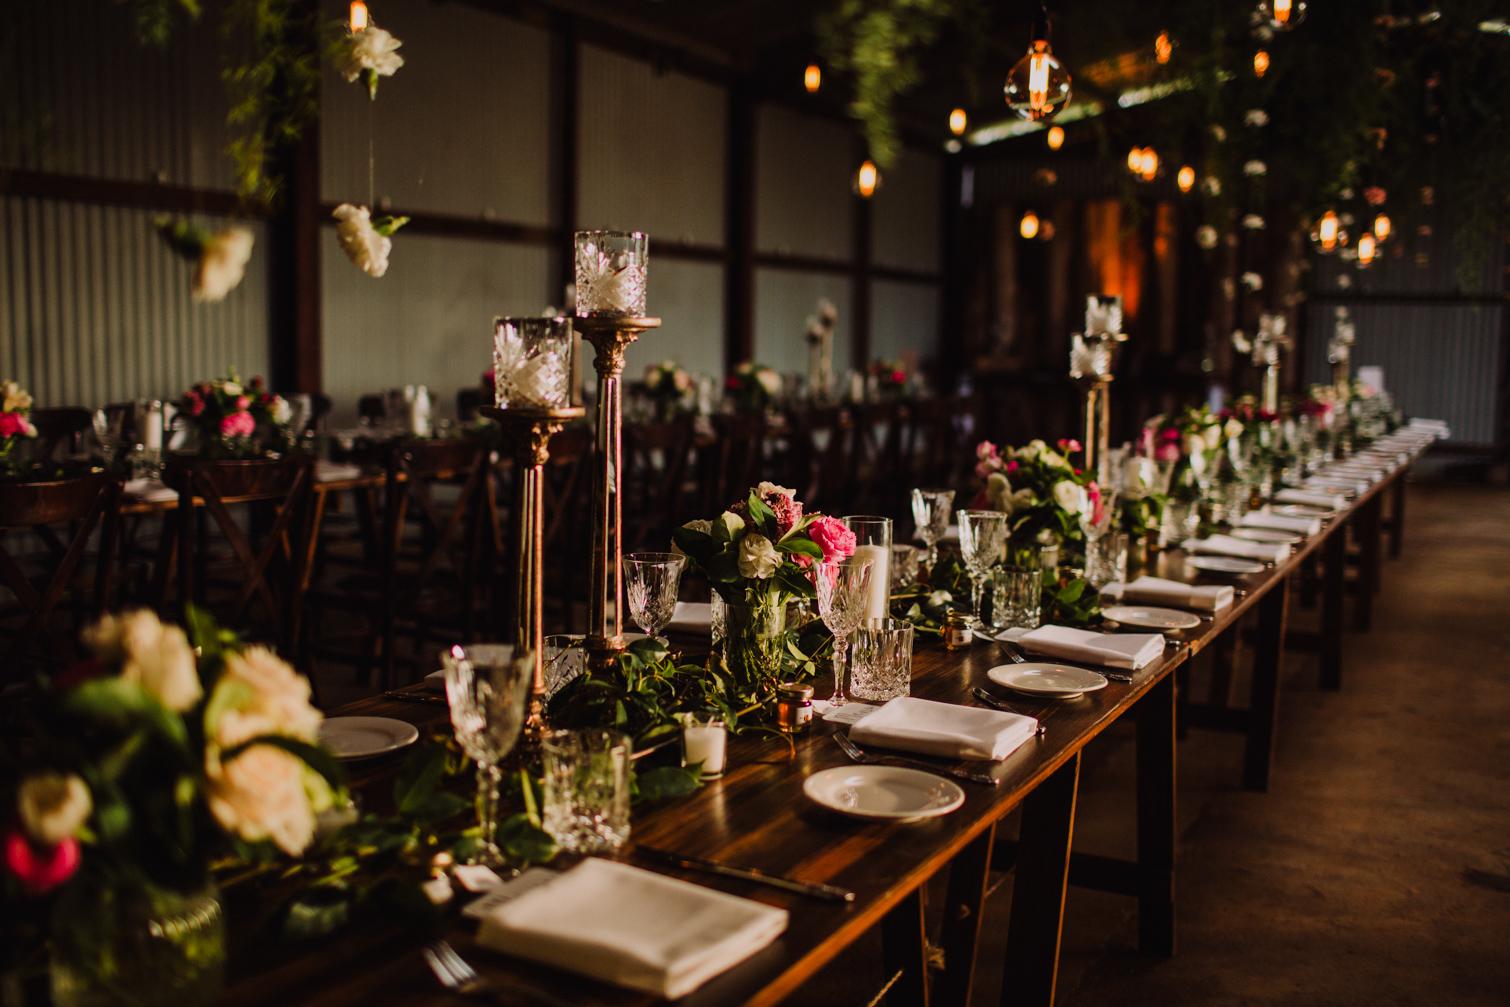 The_French_Petal_Wedding-Florist-14.jpg